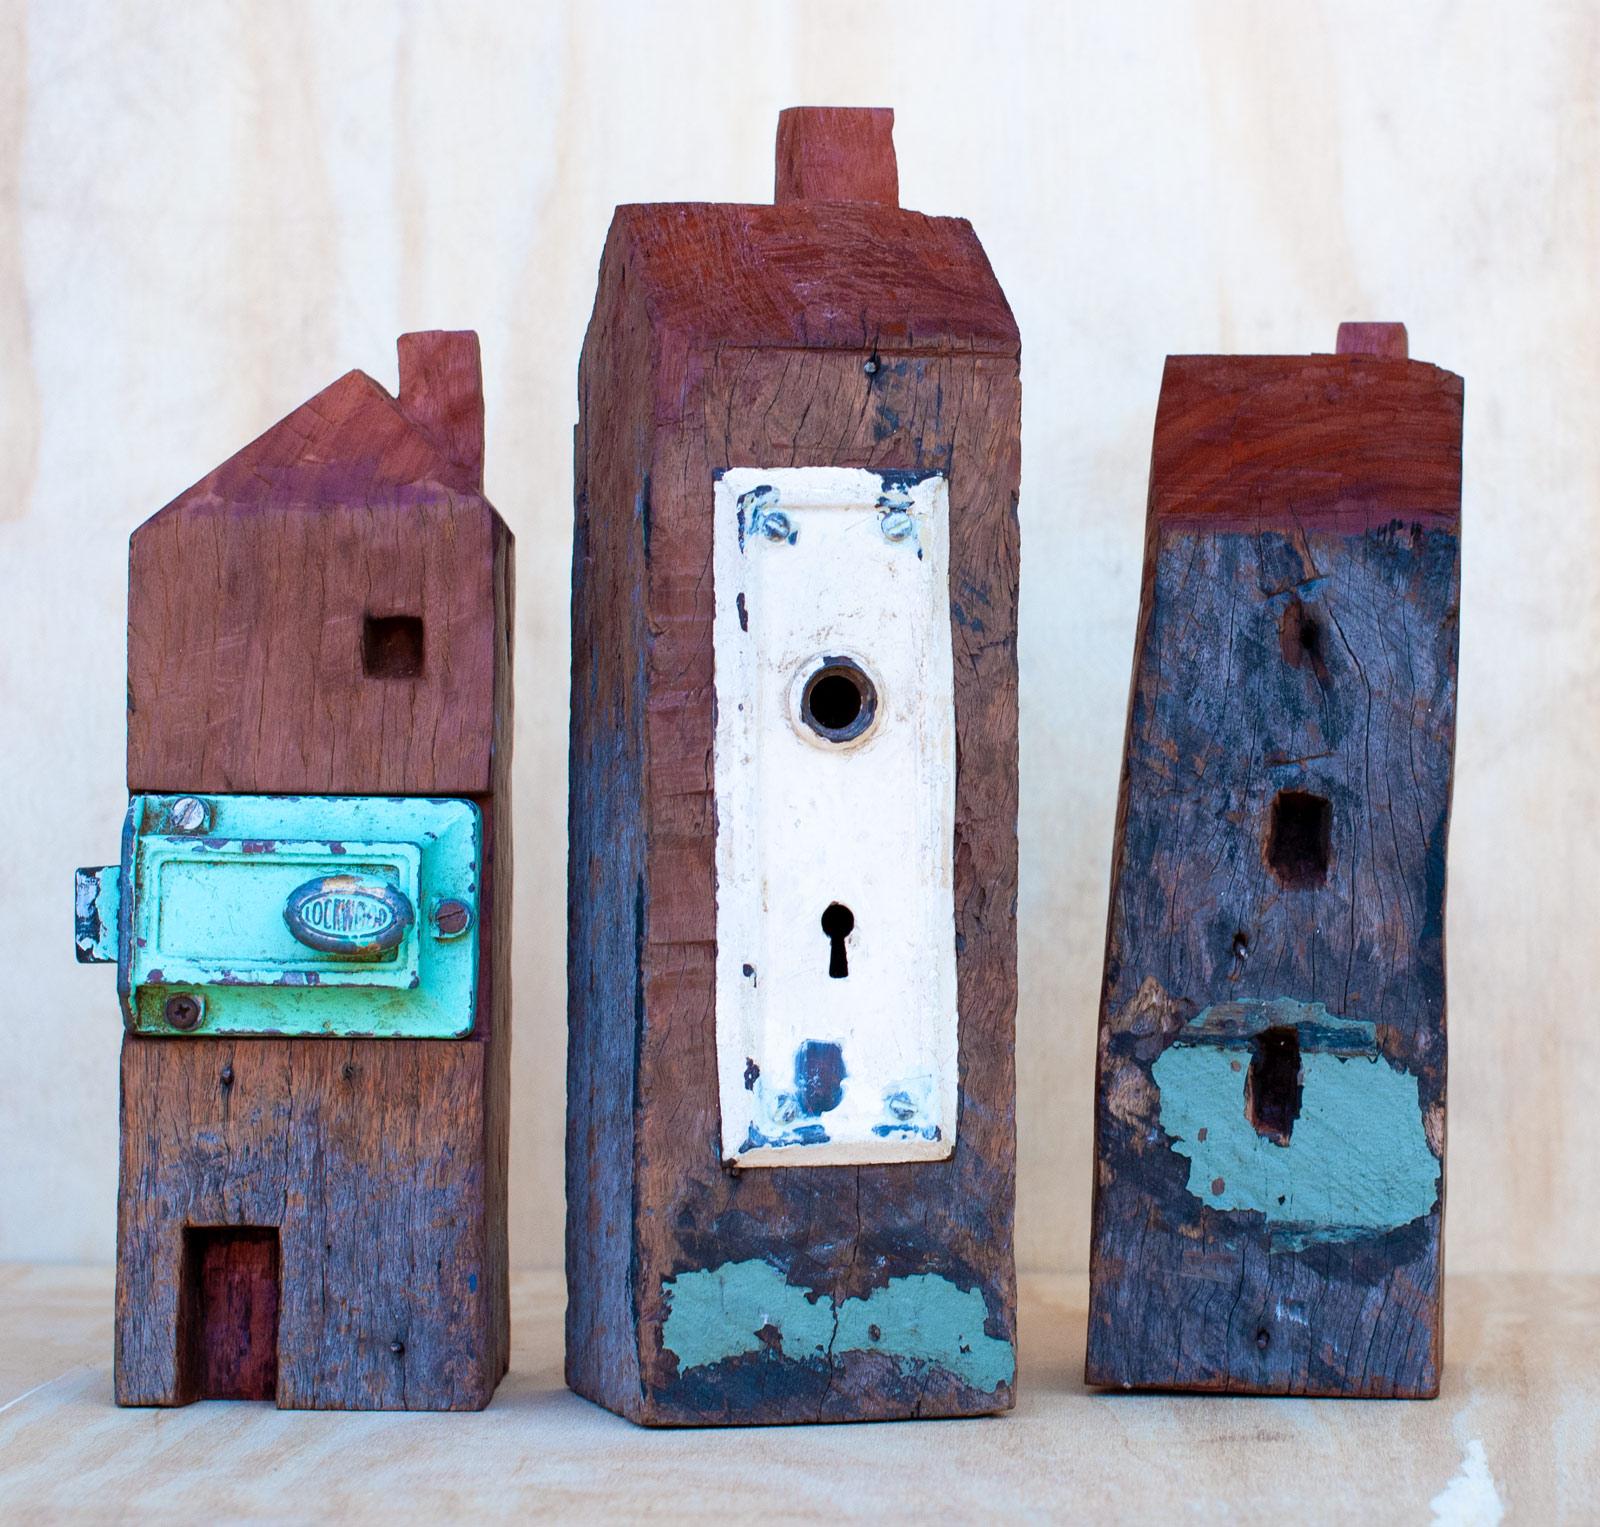 Three redwood house sculptures by Ingrid K Brooker